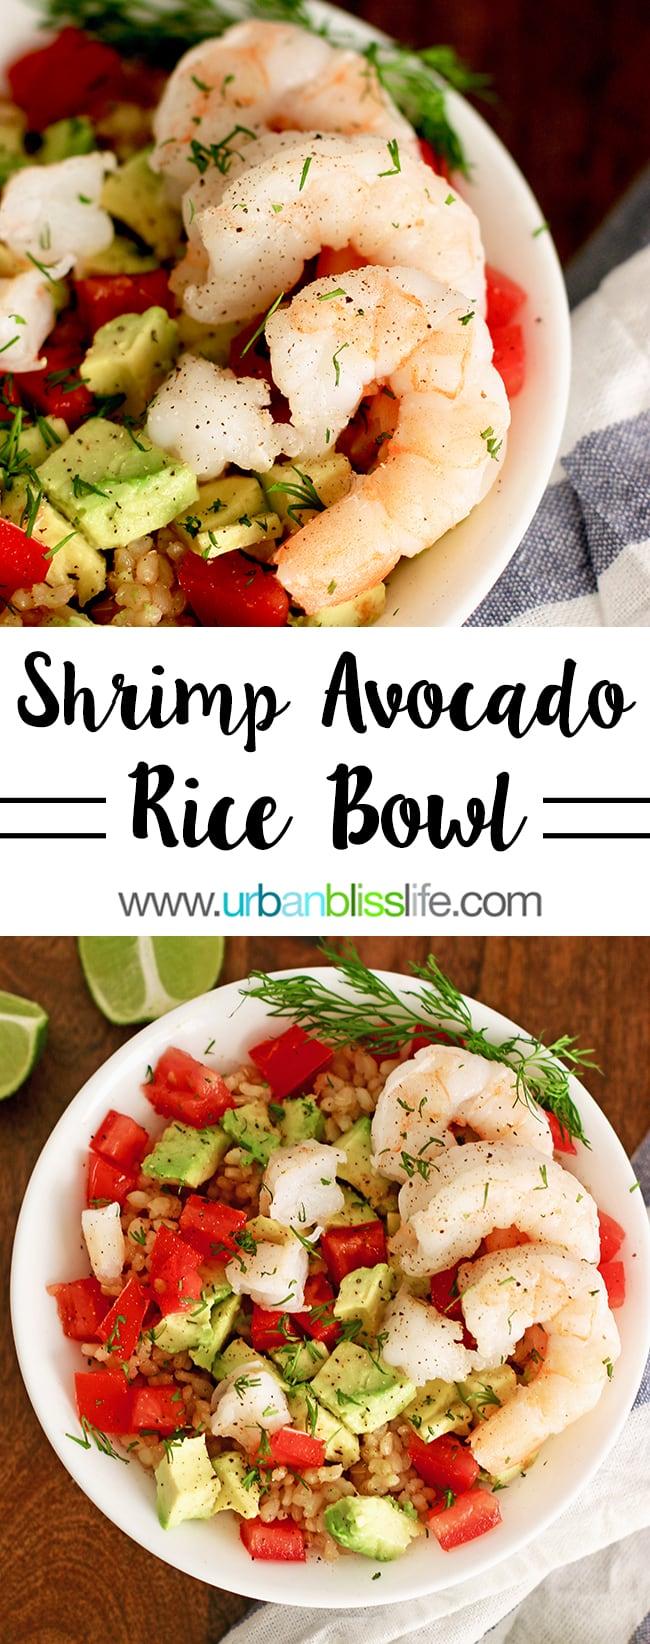 Gluten free dairy free recipes - Shrimp Avocado Brown Rice Bowl on UrbanBlissLife.com